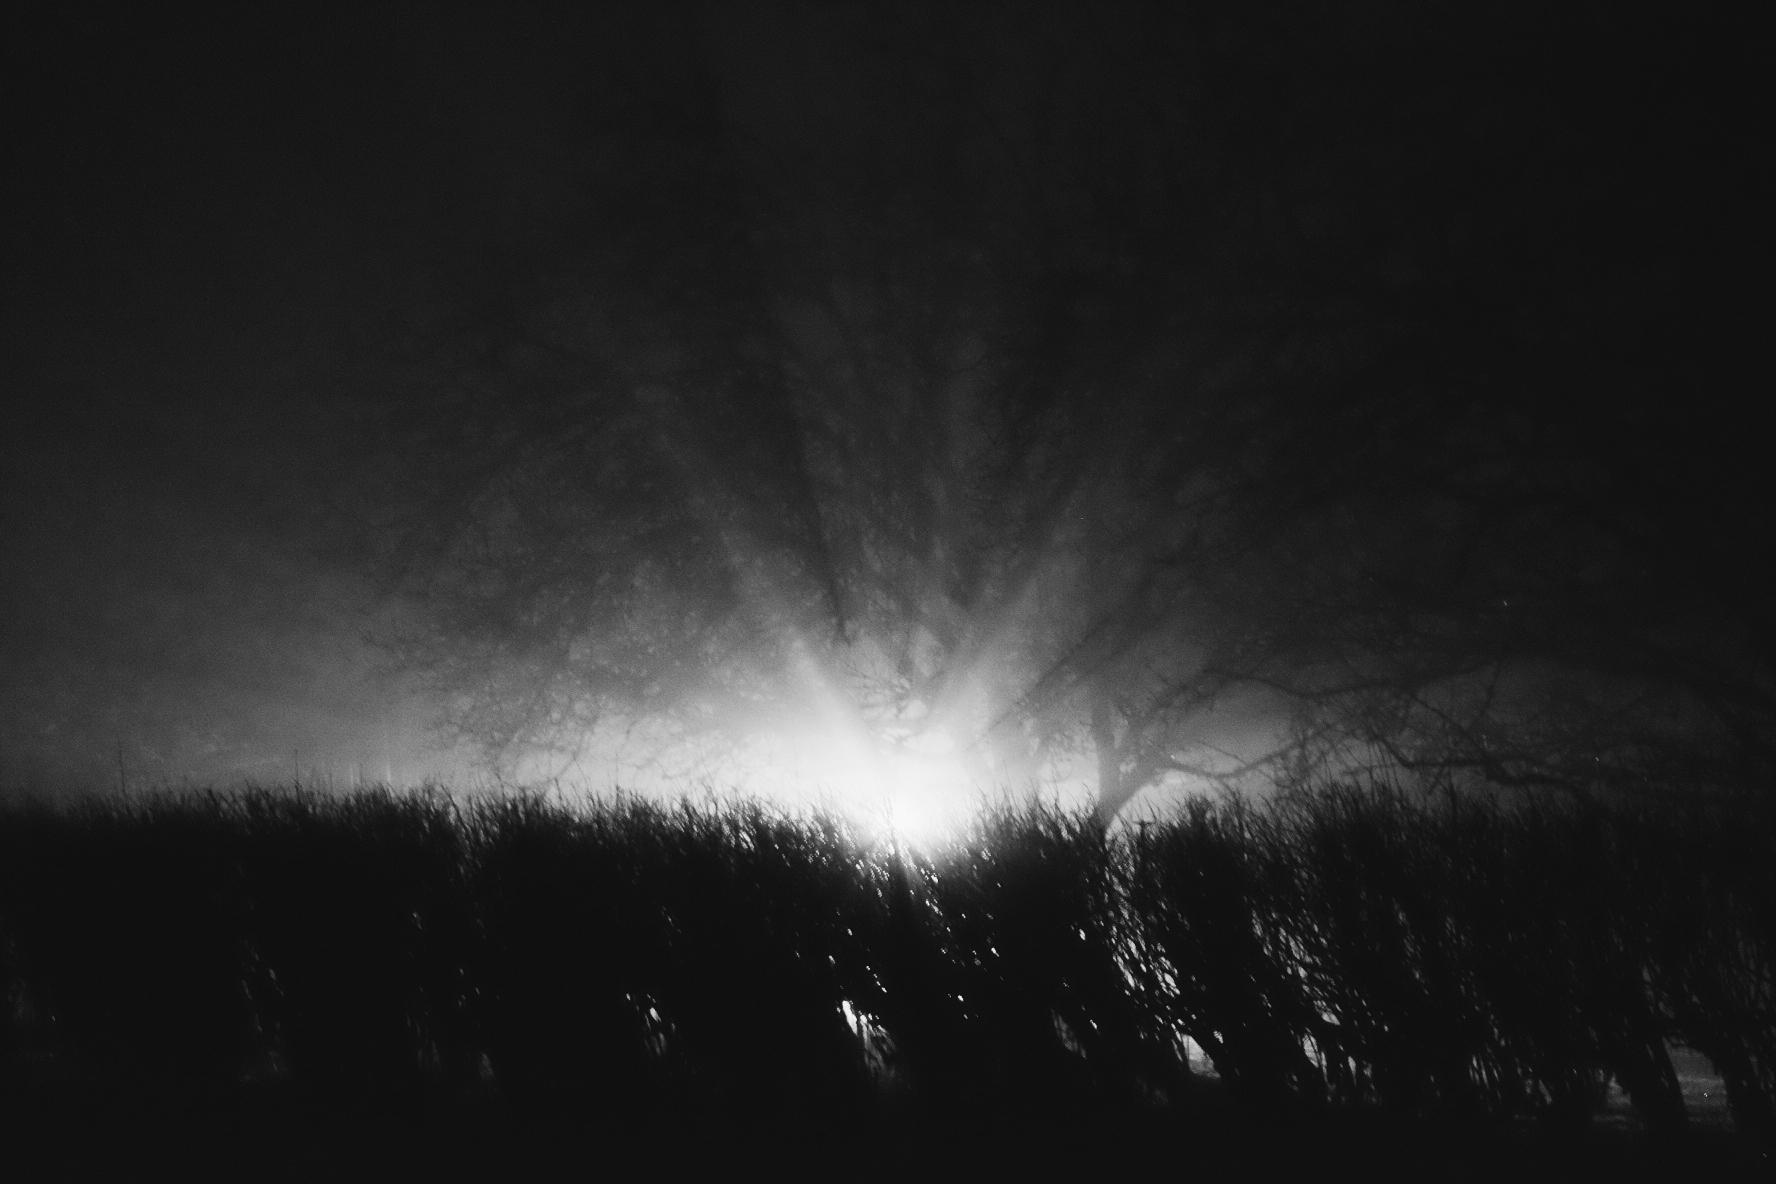 38. Fogburst